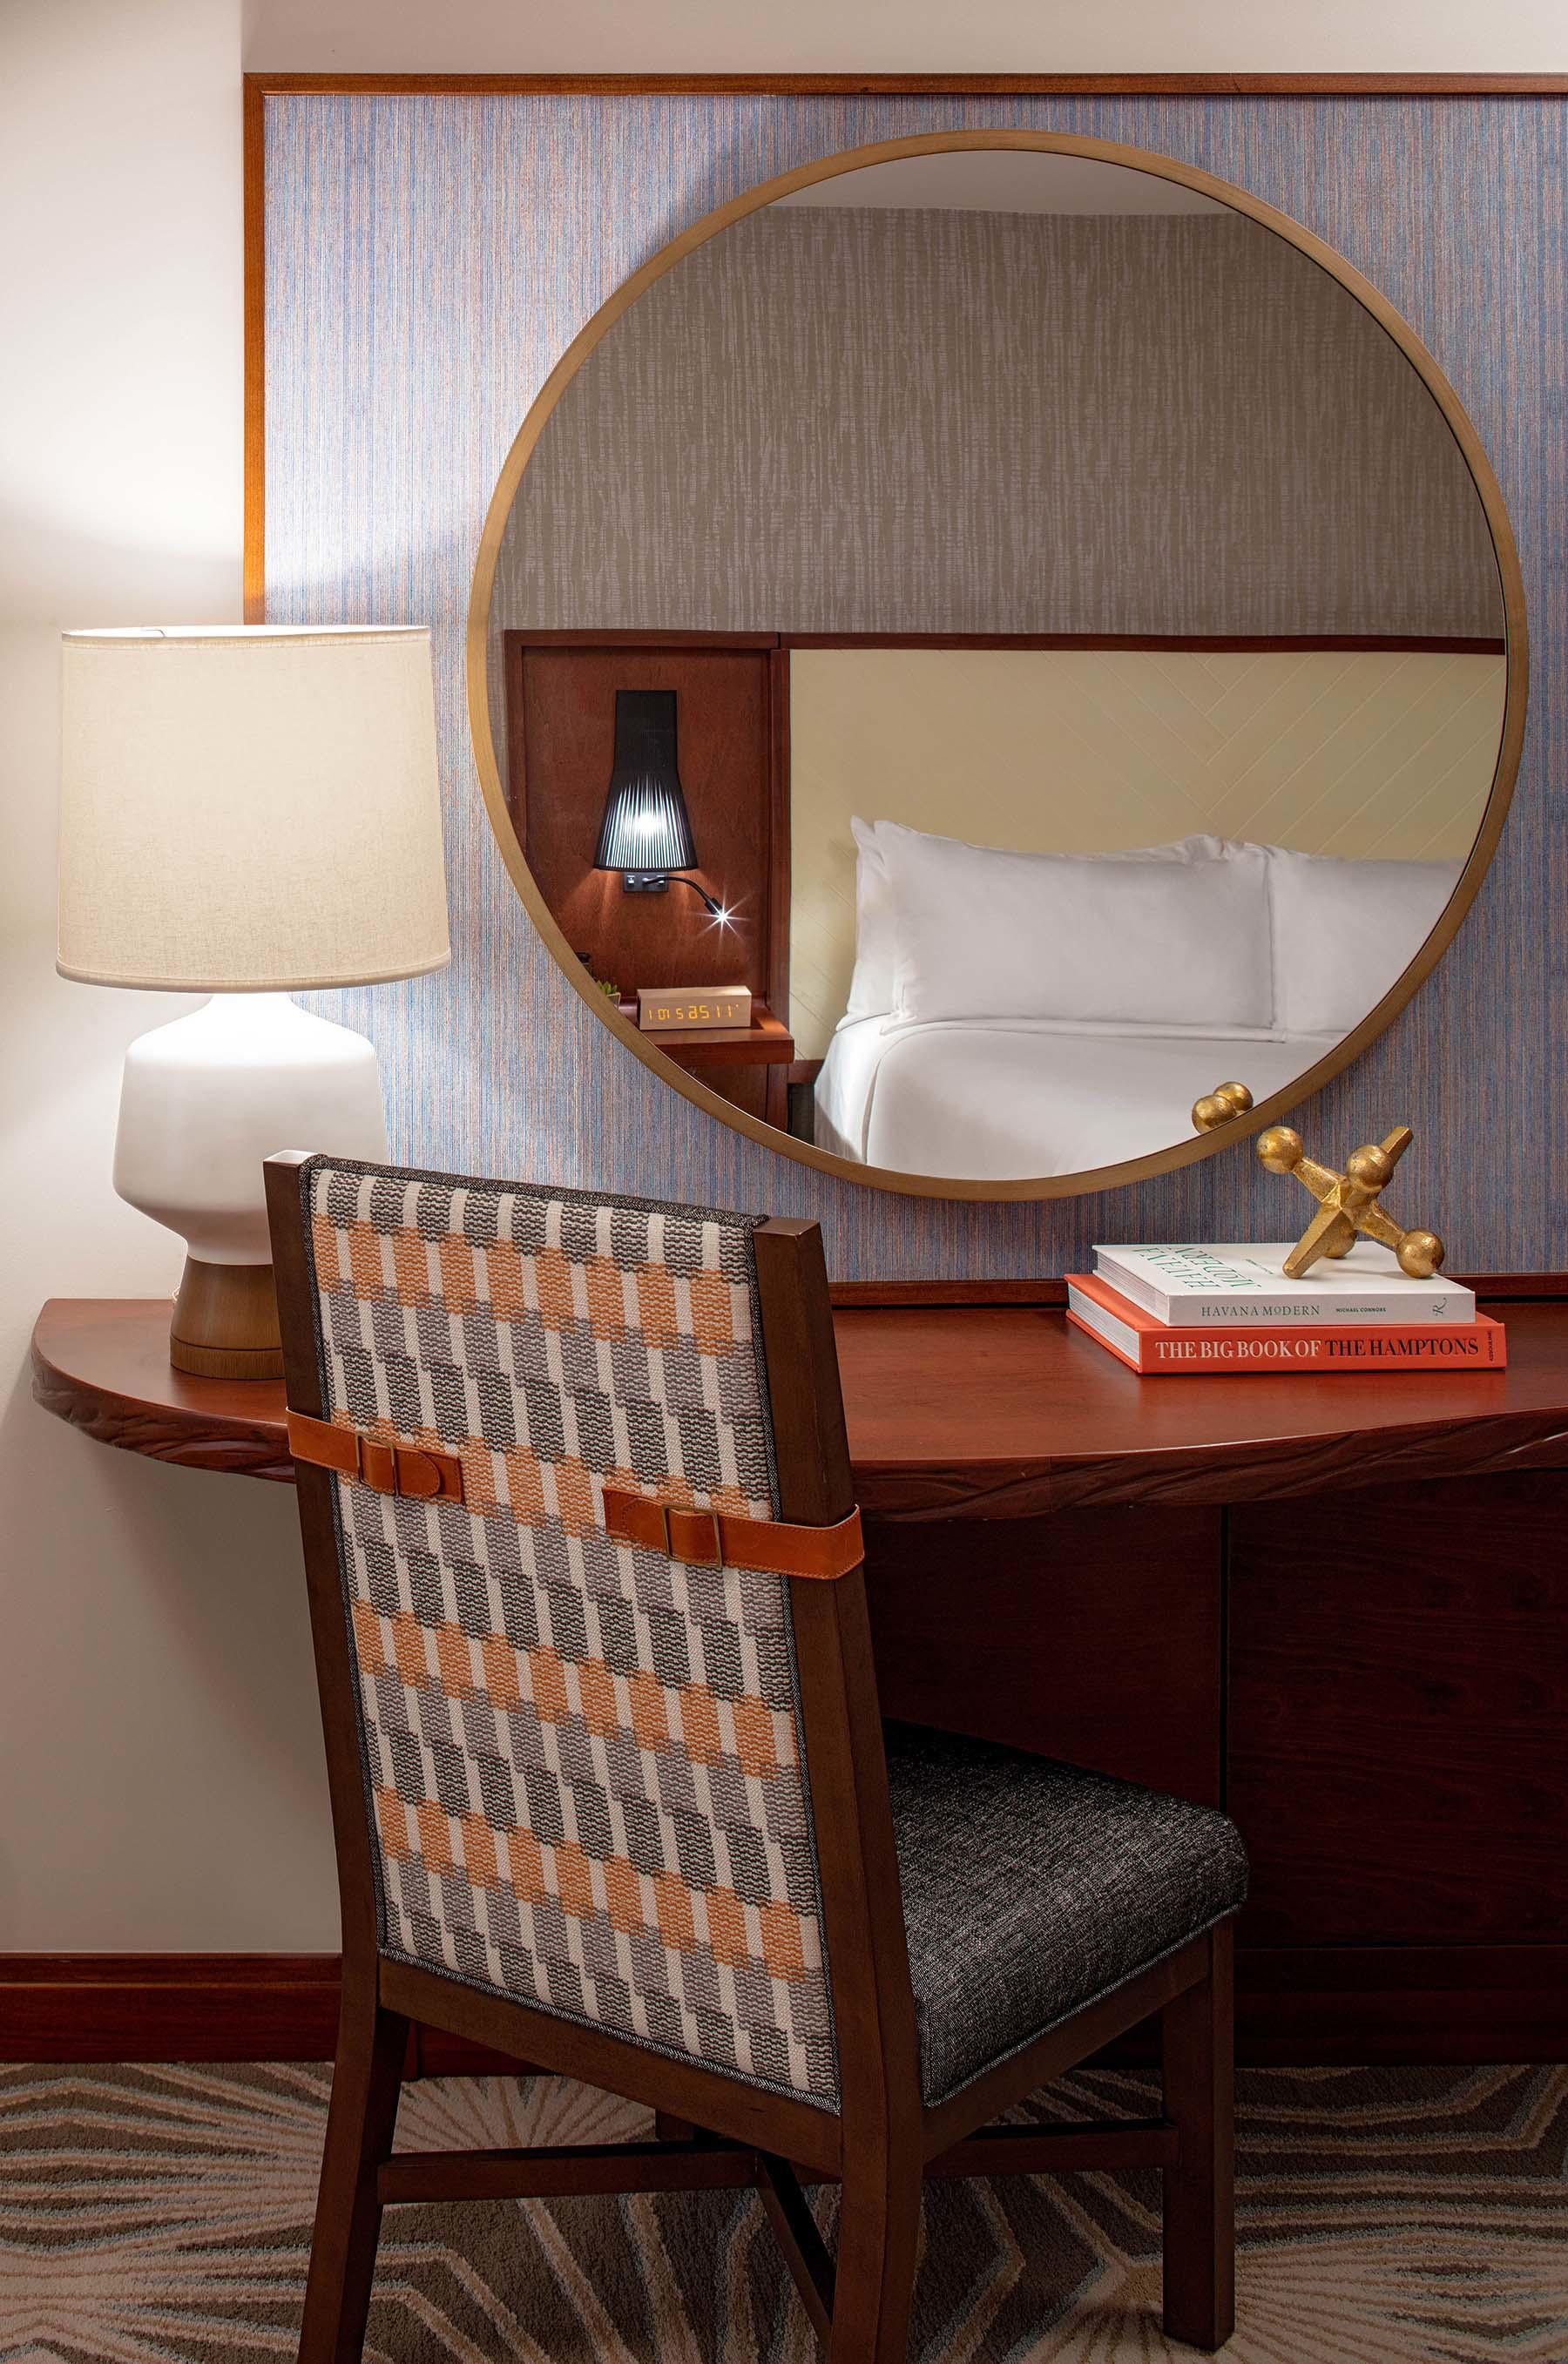 Hotel Adeline image 11